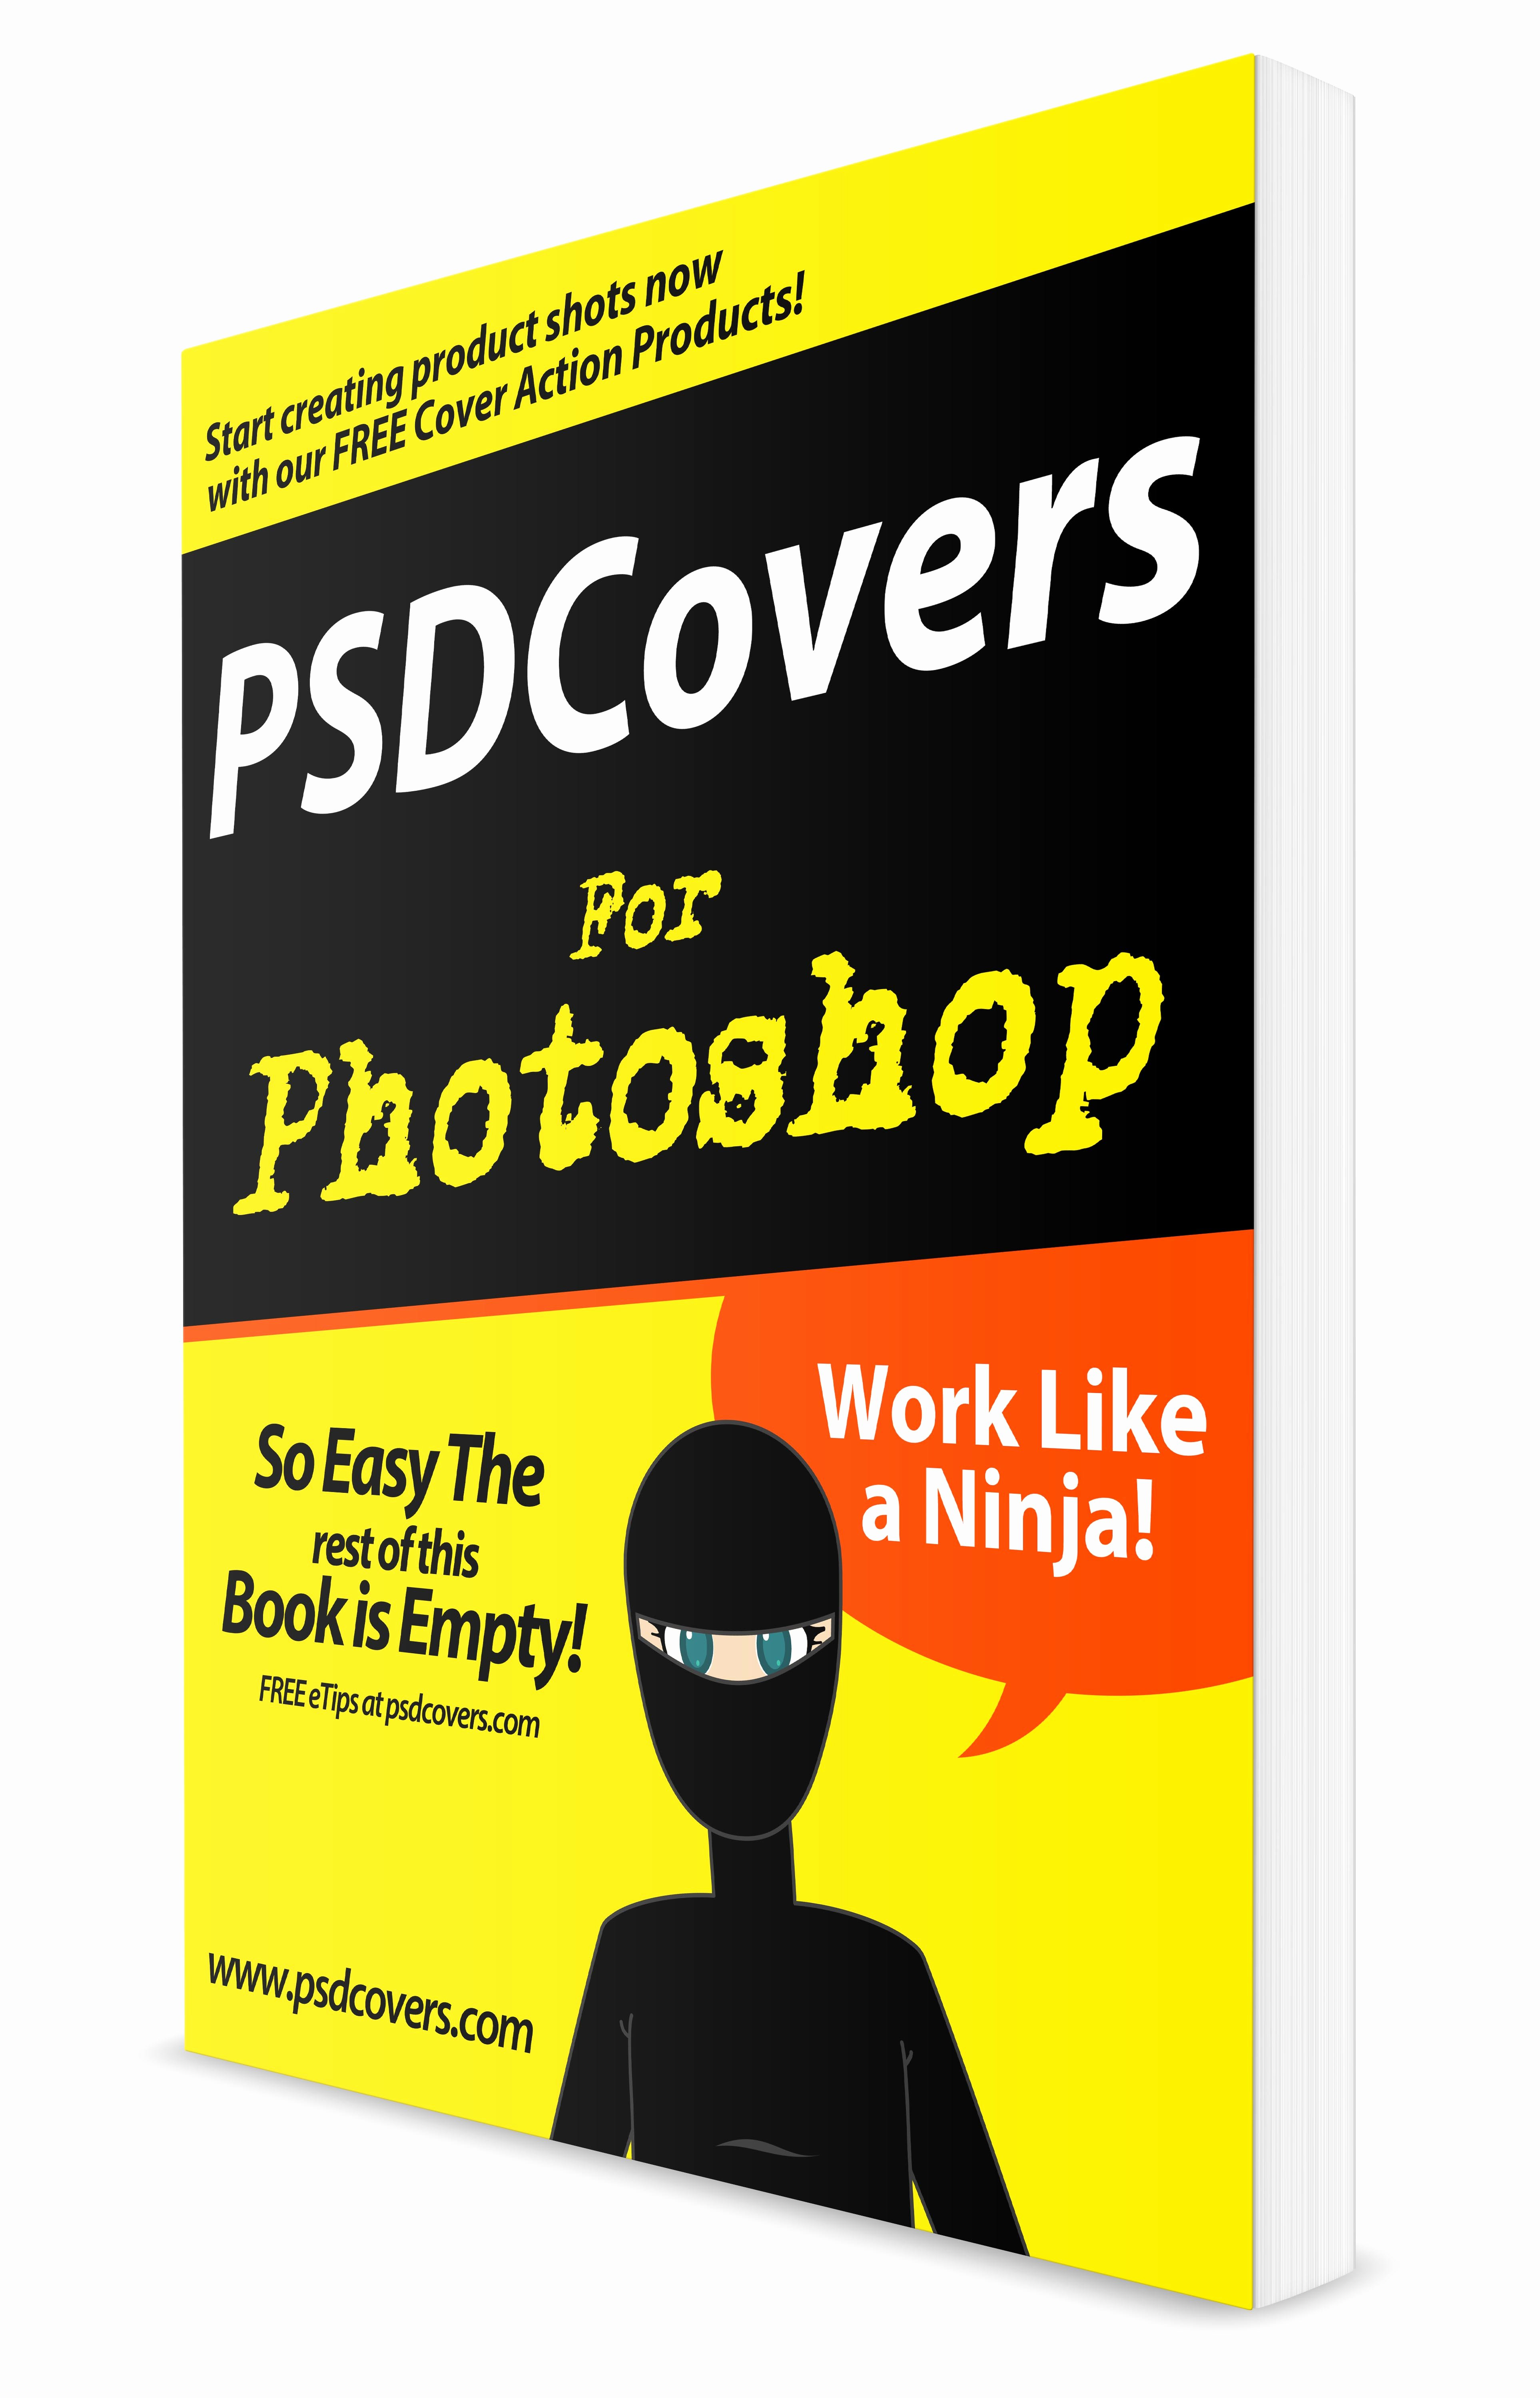 Book for Dummies Template Unique Ebook Mockups Psd Mockups